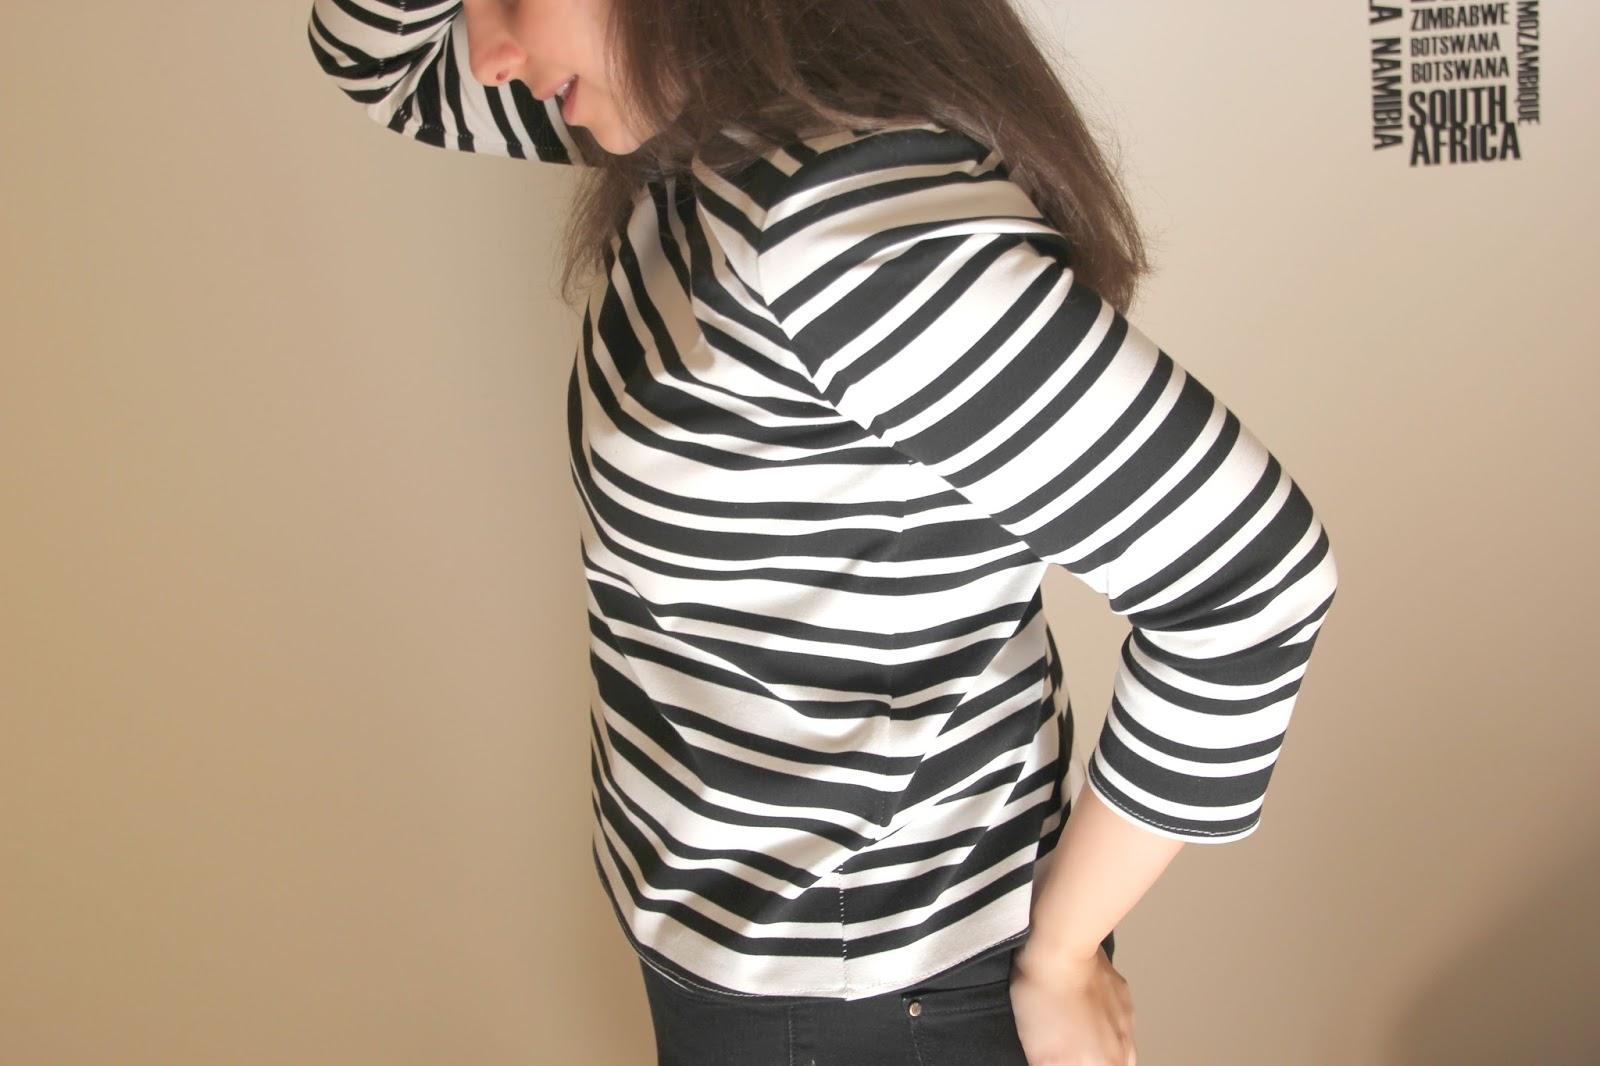 d4c0ae81b5 Gratis Básica Diy Oh patrones Mujer Mine Diy De Mother Camiseta qZXZw6S